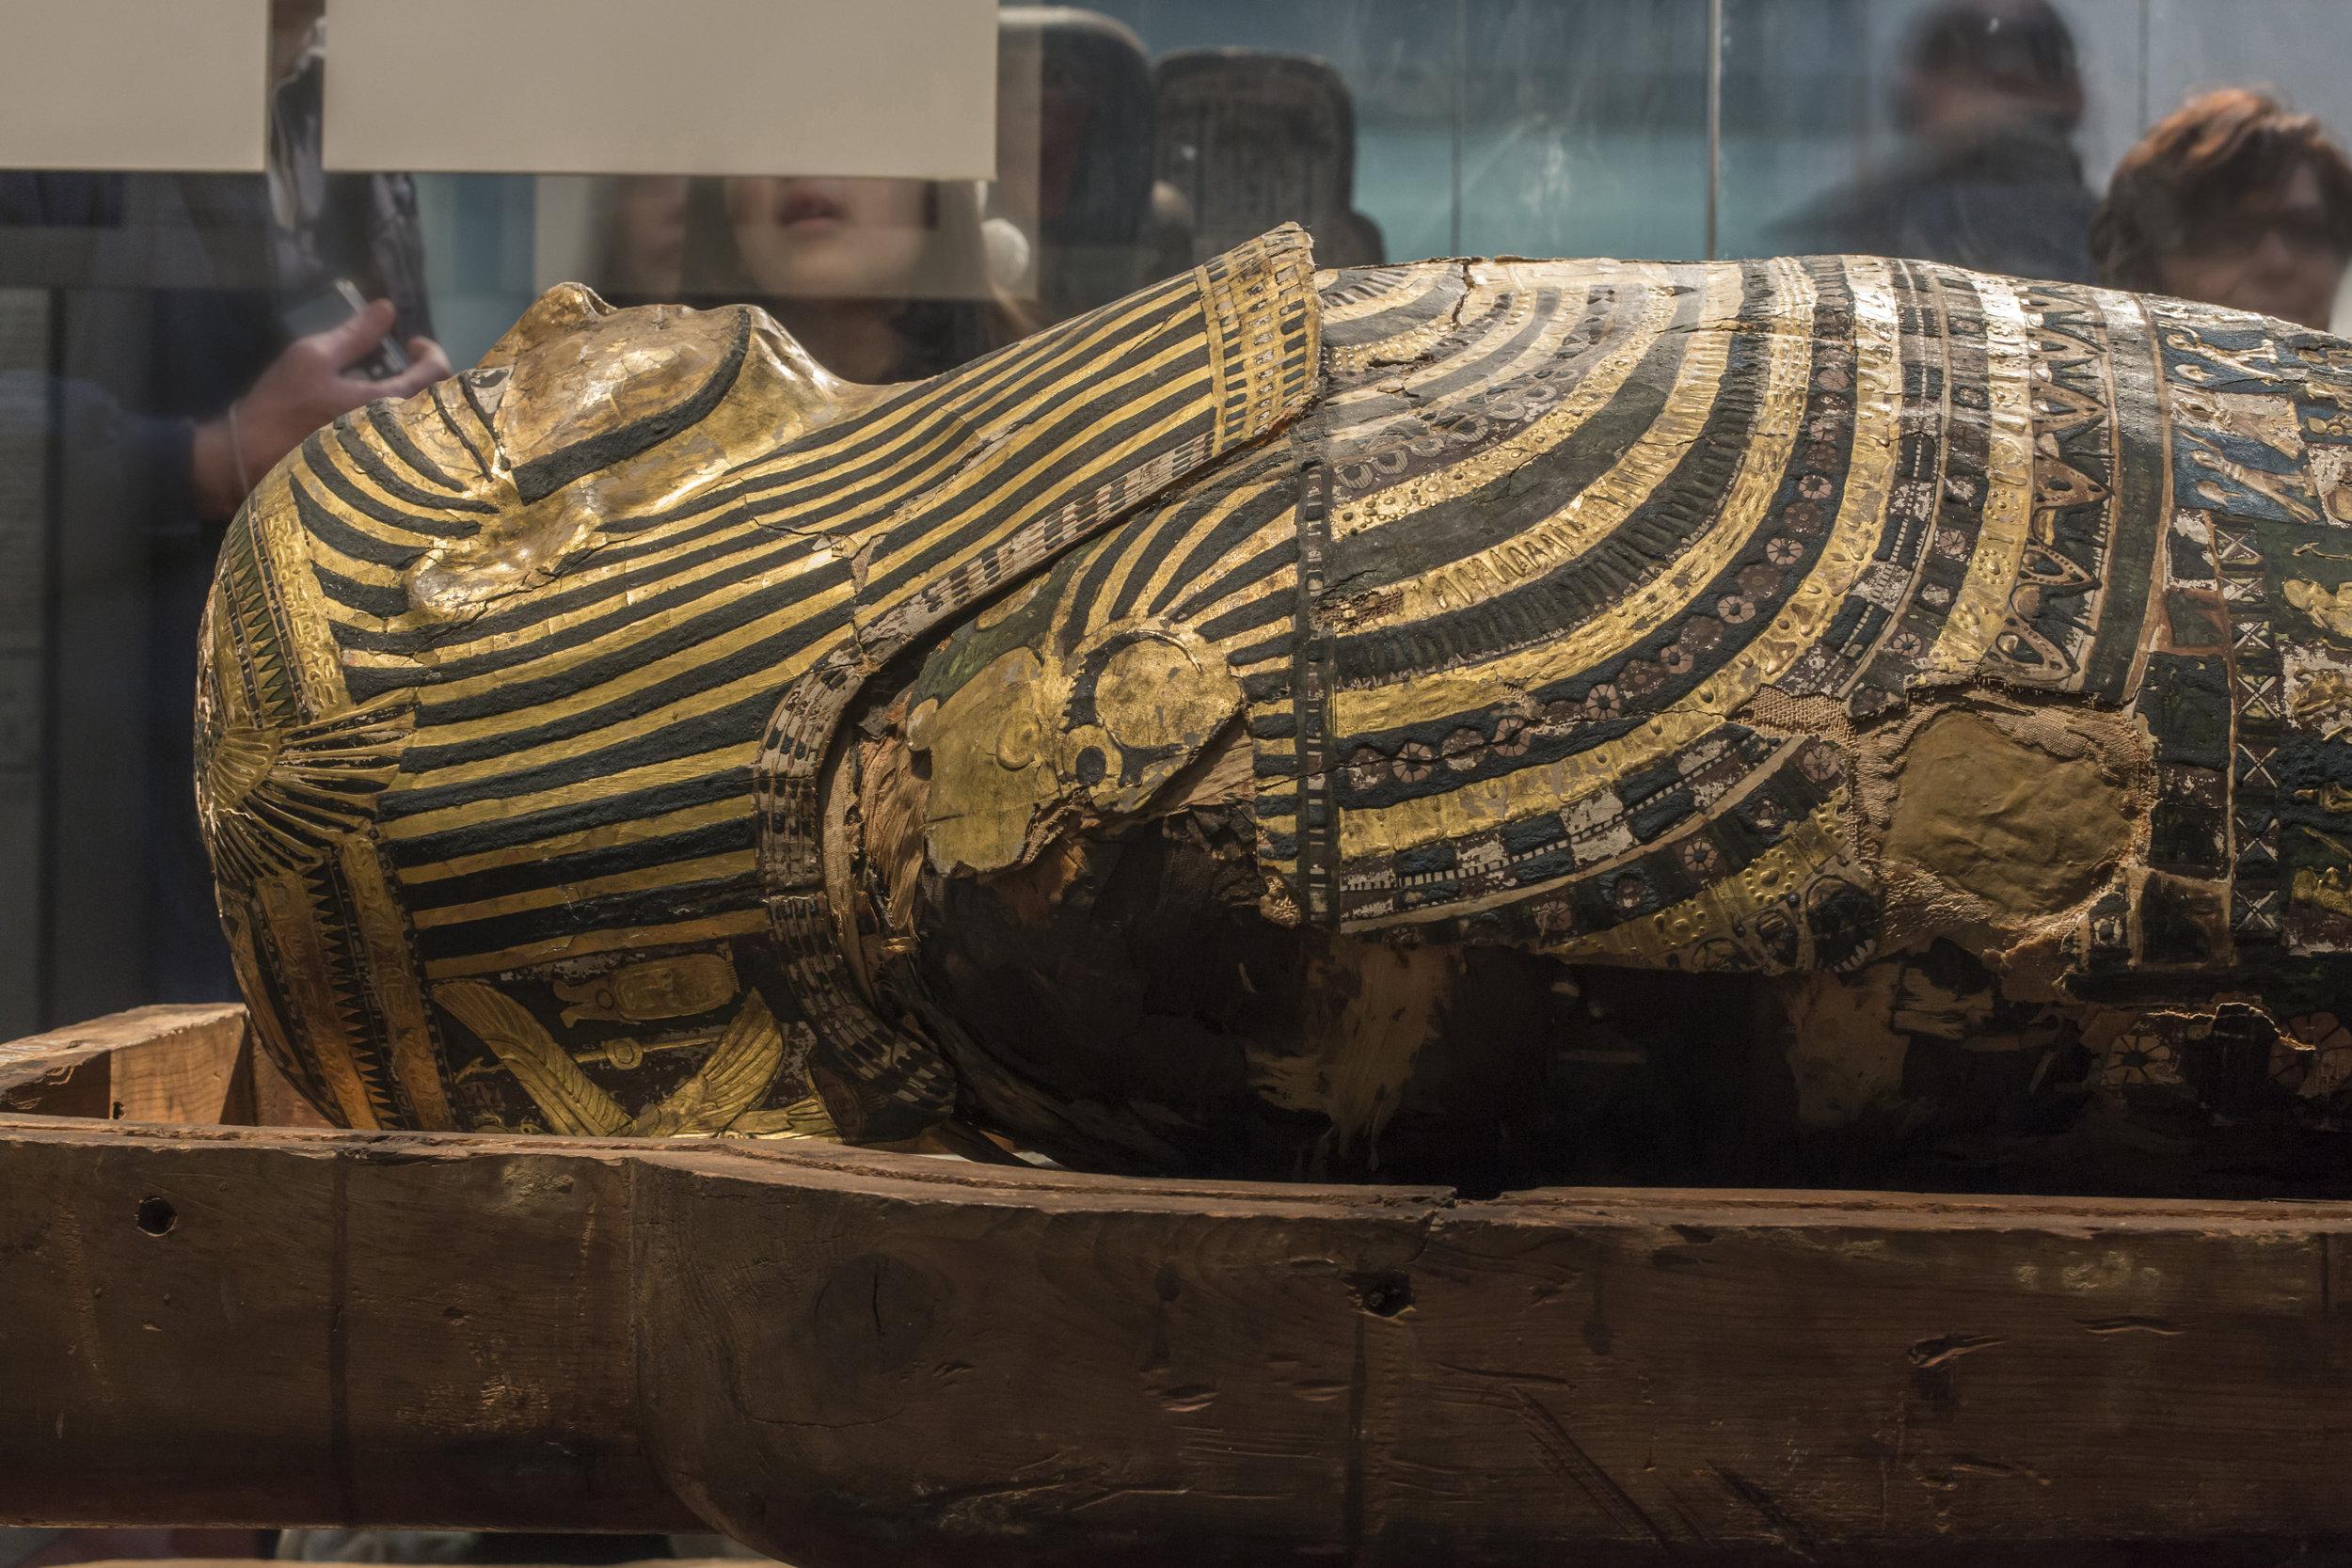 Egyptian Artifacts Ancient Sarcophagus Mummy.JPG